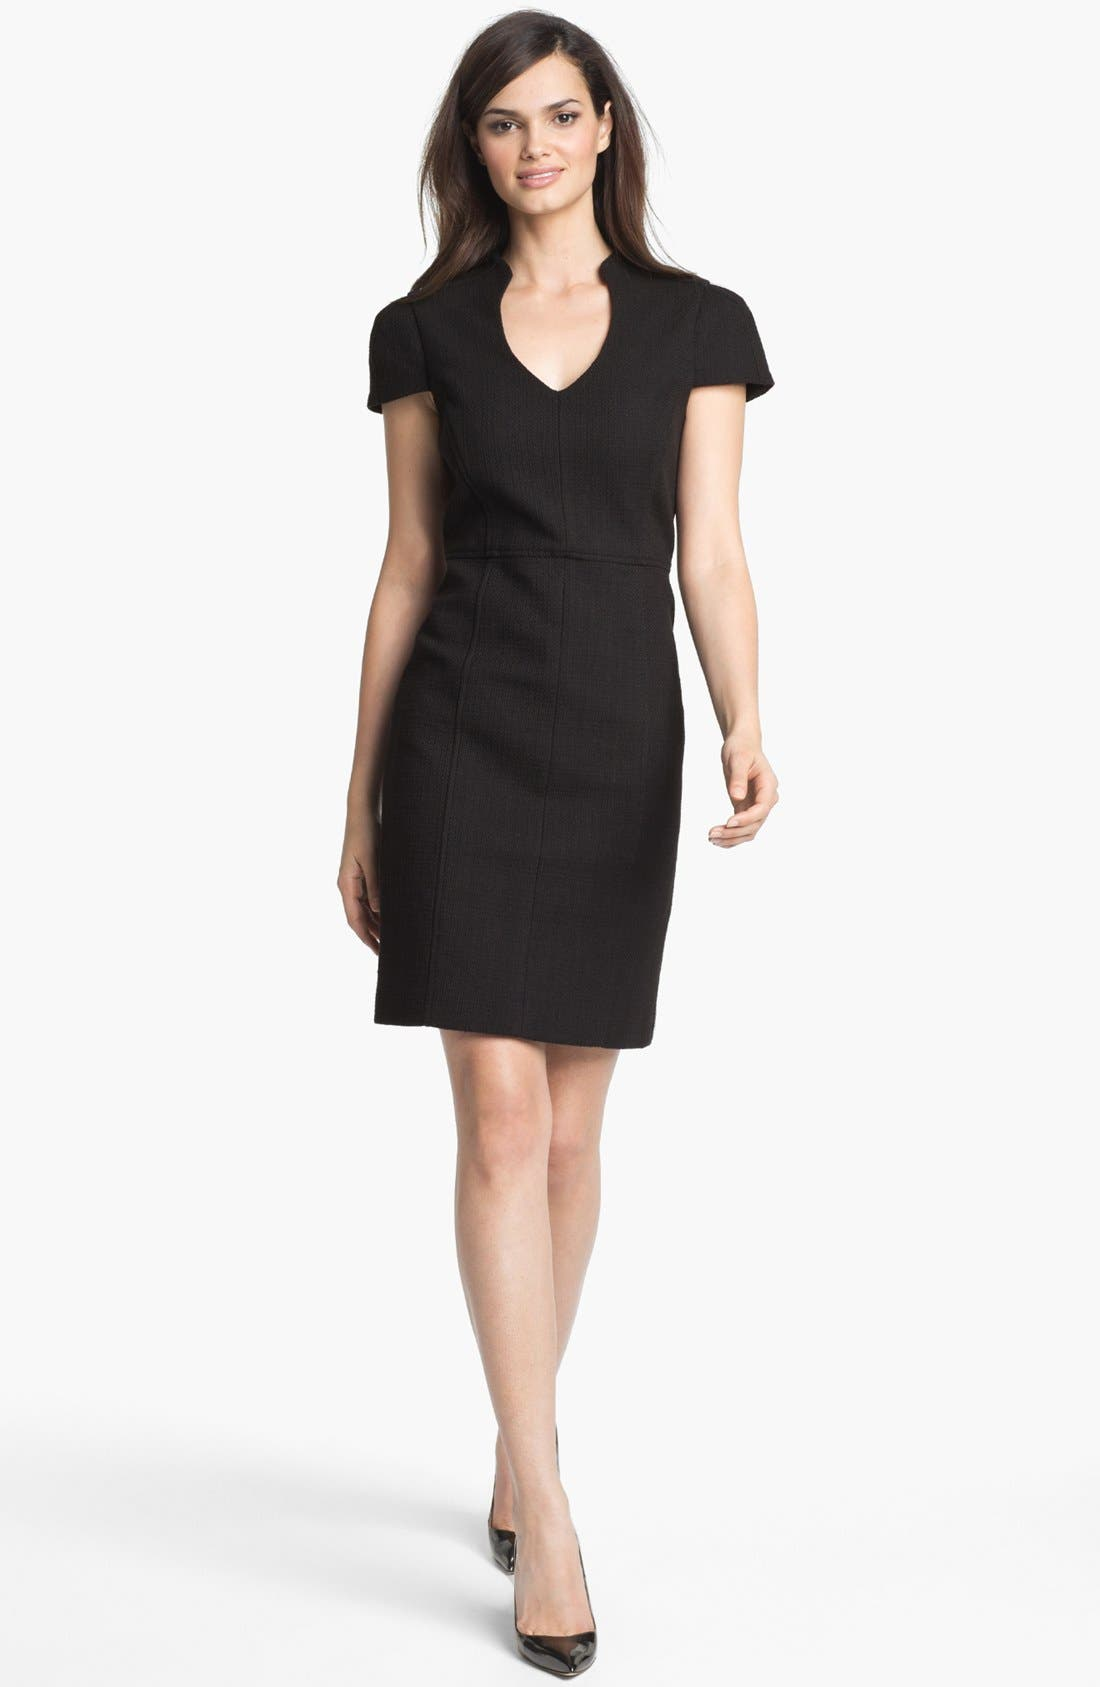 Main Image - 4.collective Basket Weave Sheath Dress